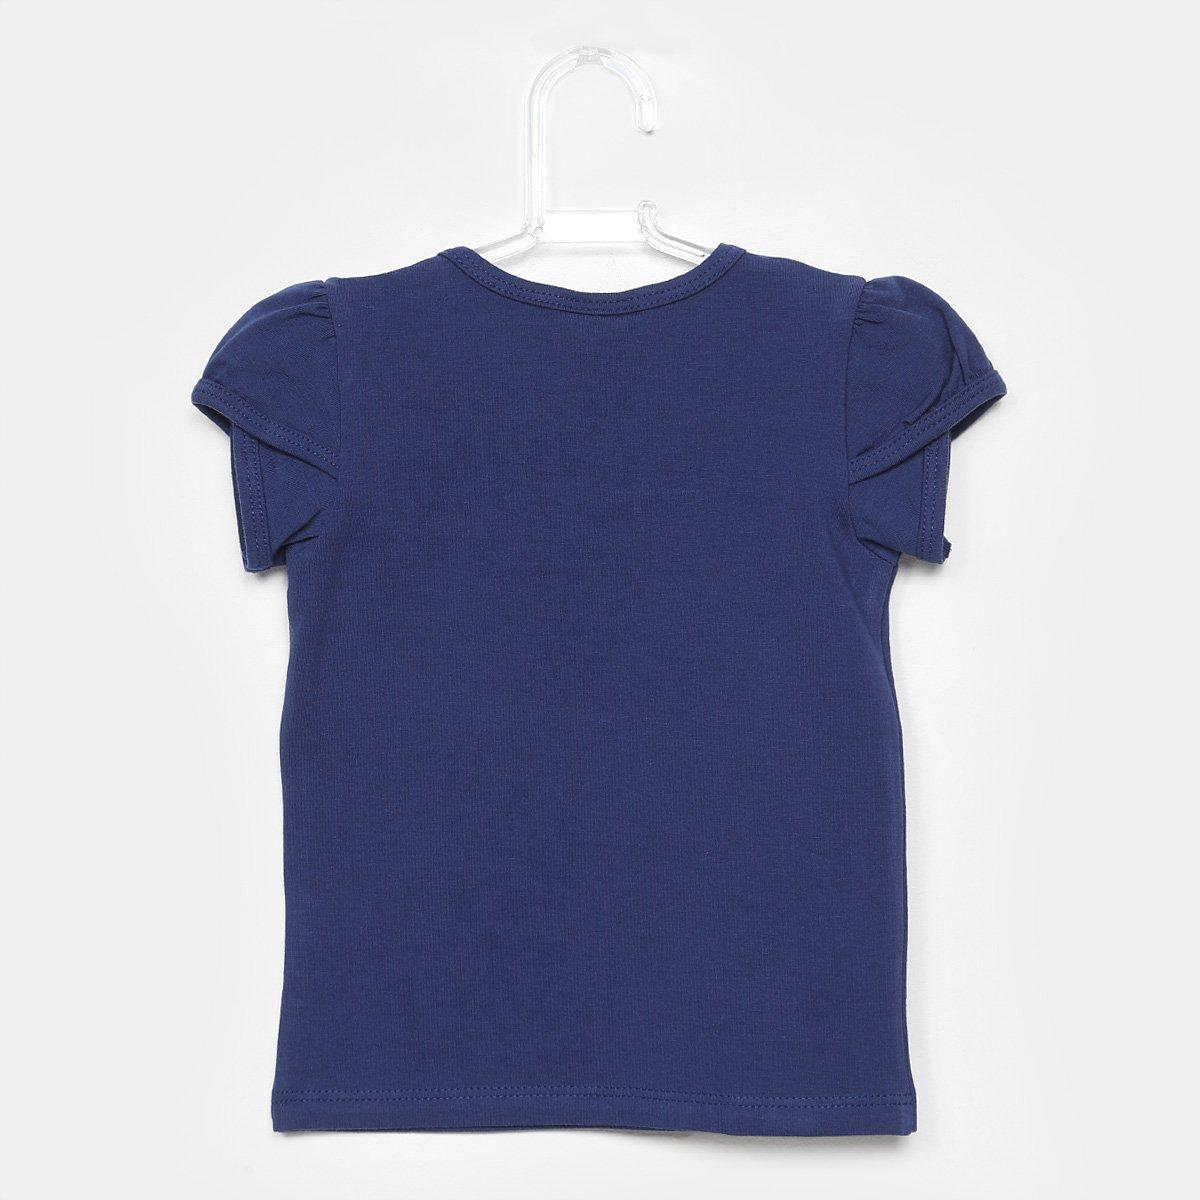 Básica Milon Milon Blusa Blusa Infantil Infantil Básica Feminina Azul XY6tw